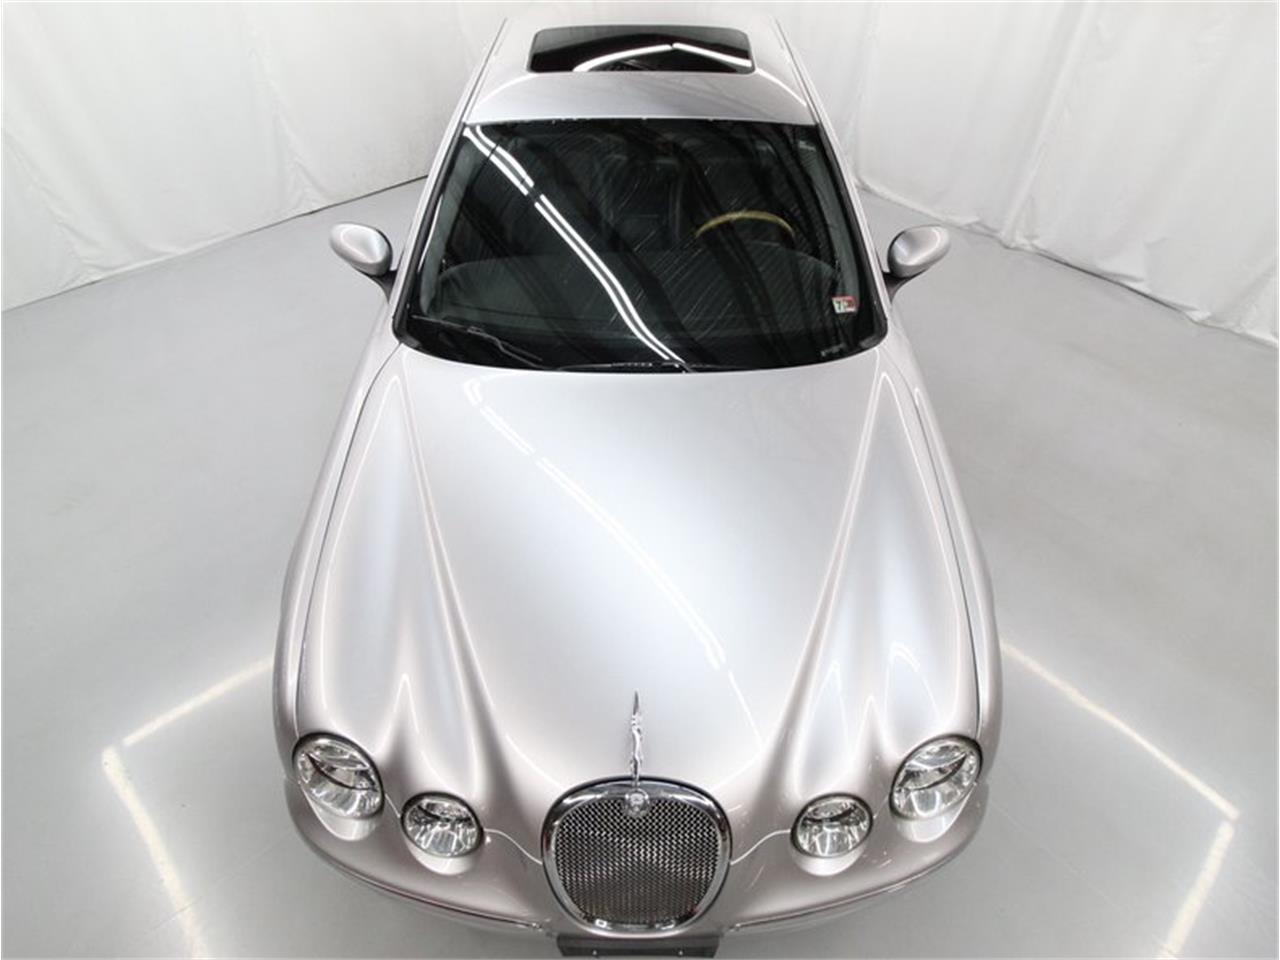 2005 Jaguar S-Type (CC-1413616) for sale in Christiansburg, Virginia